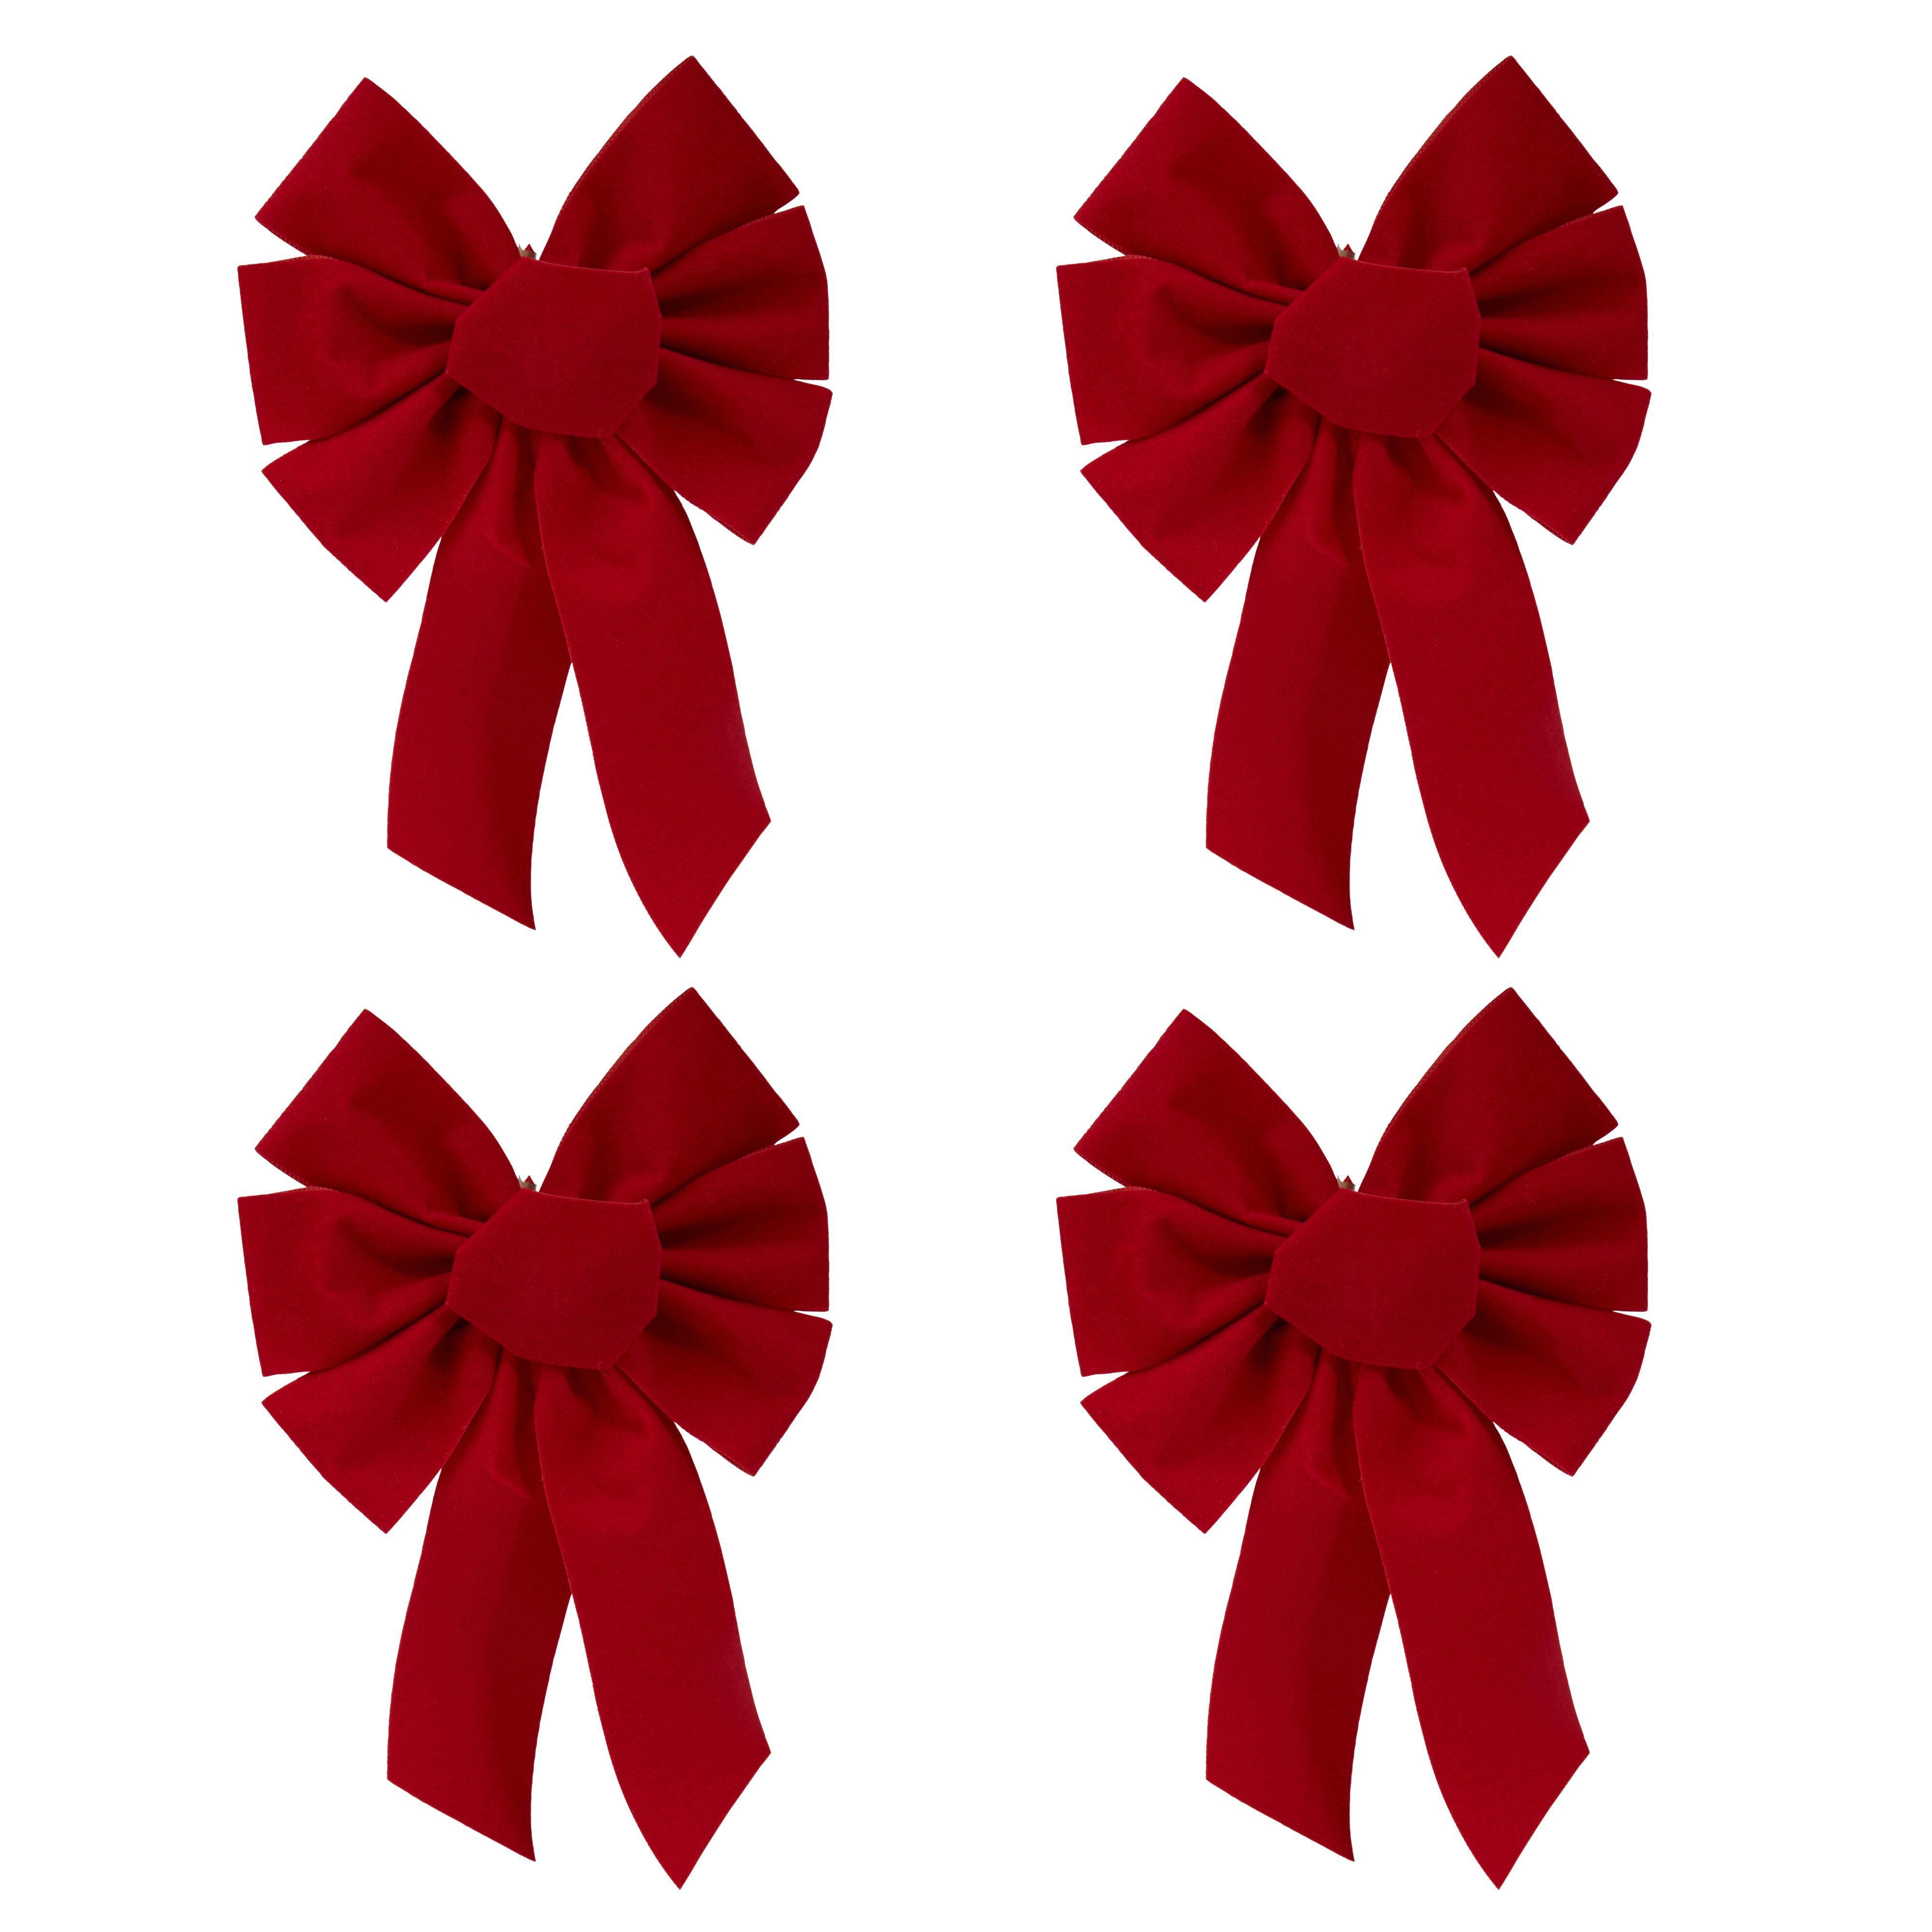 Velvet Effect Red Bows Tree Decoration, Pack Of 4